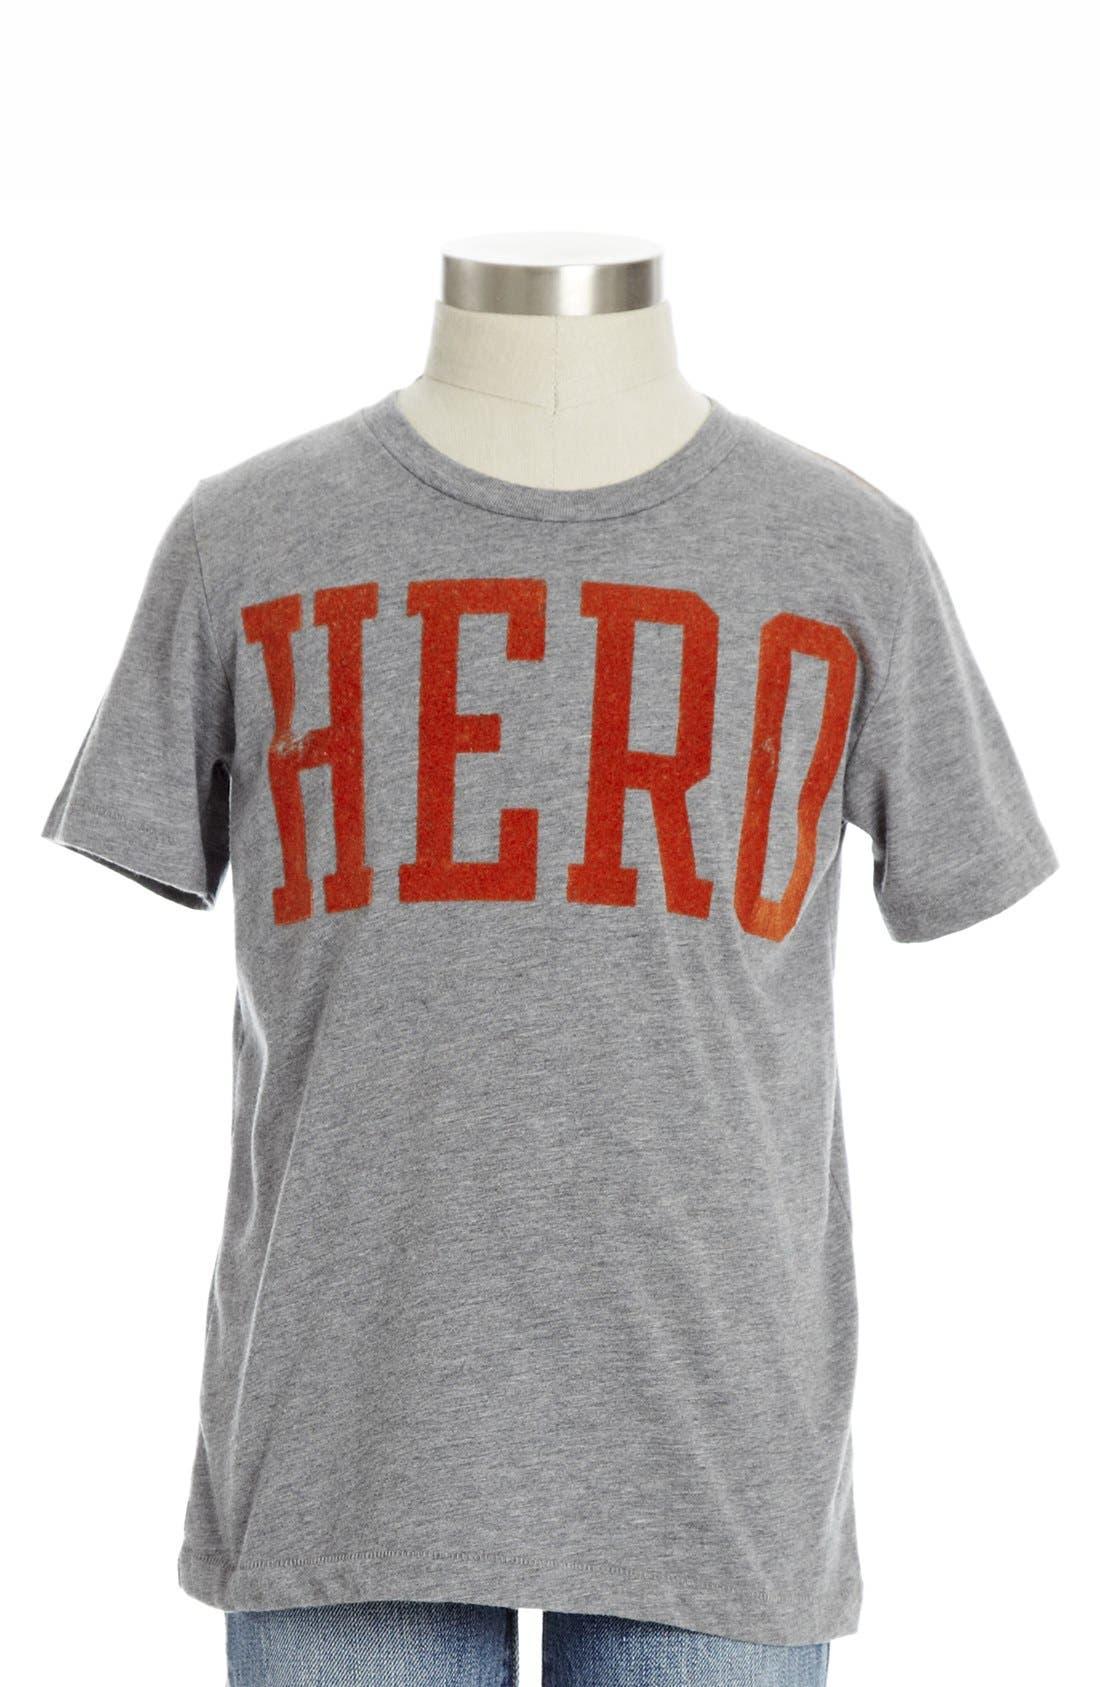 Main Image - Peek 'Hero' T-Shirt (Toddler Boys, Little Boys & Big Boys)